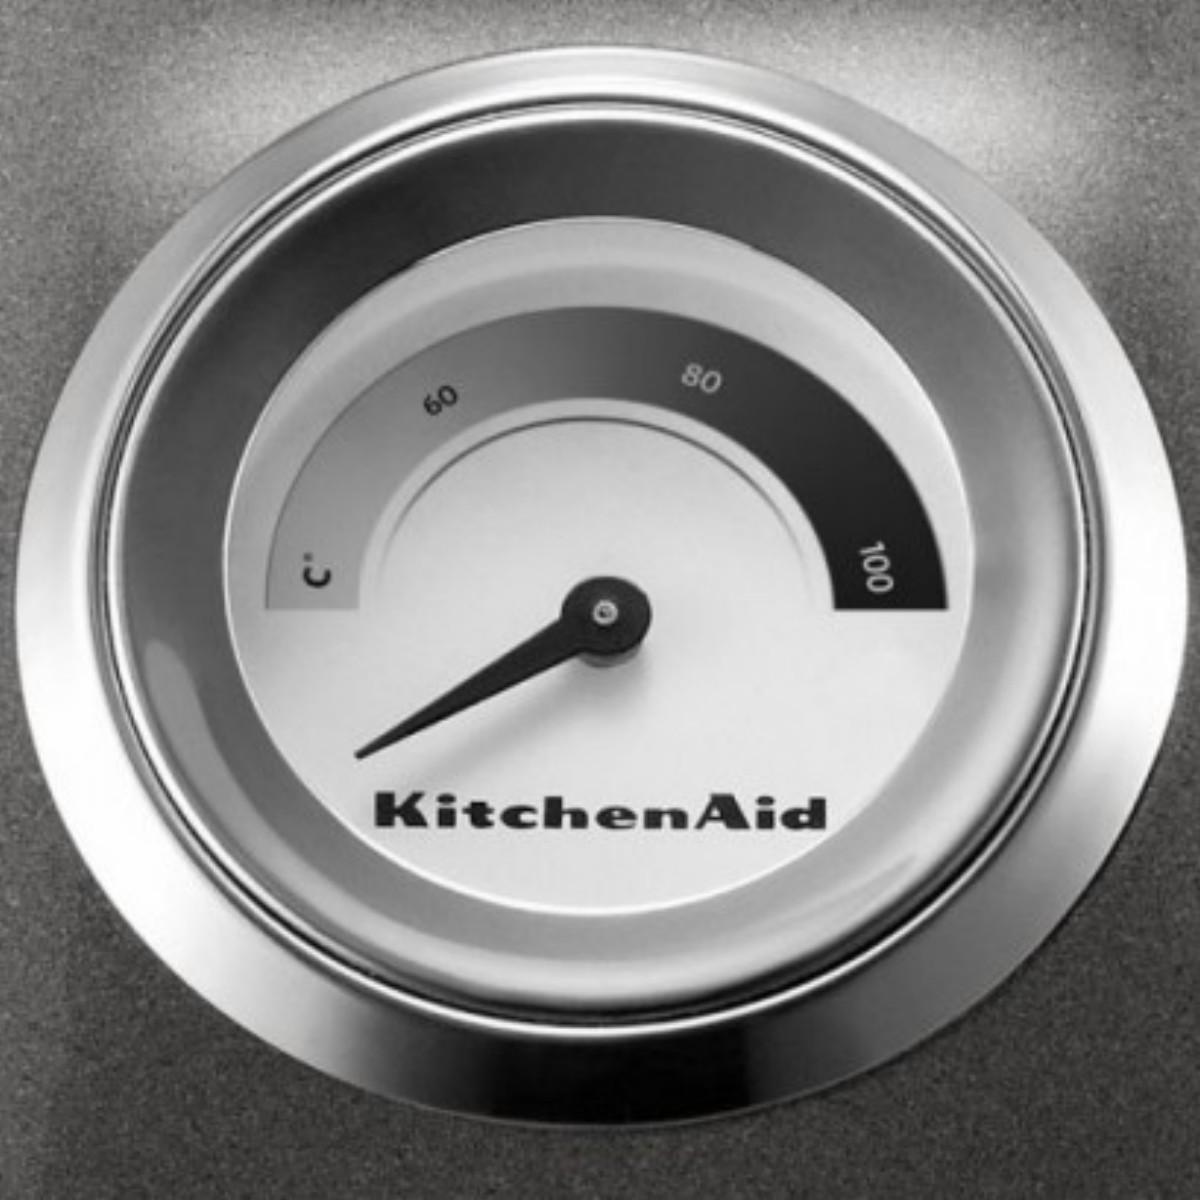 Rychlovarná konvice KitchenAid 5kek1522ems